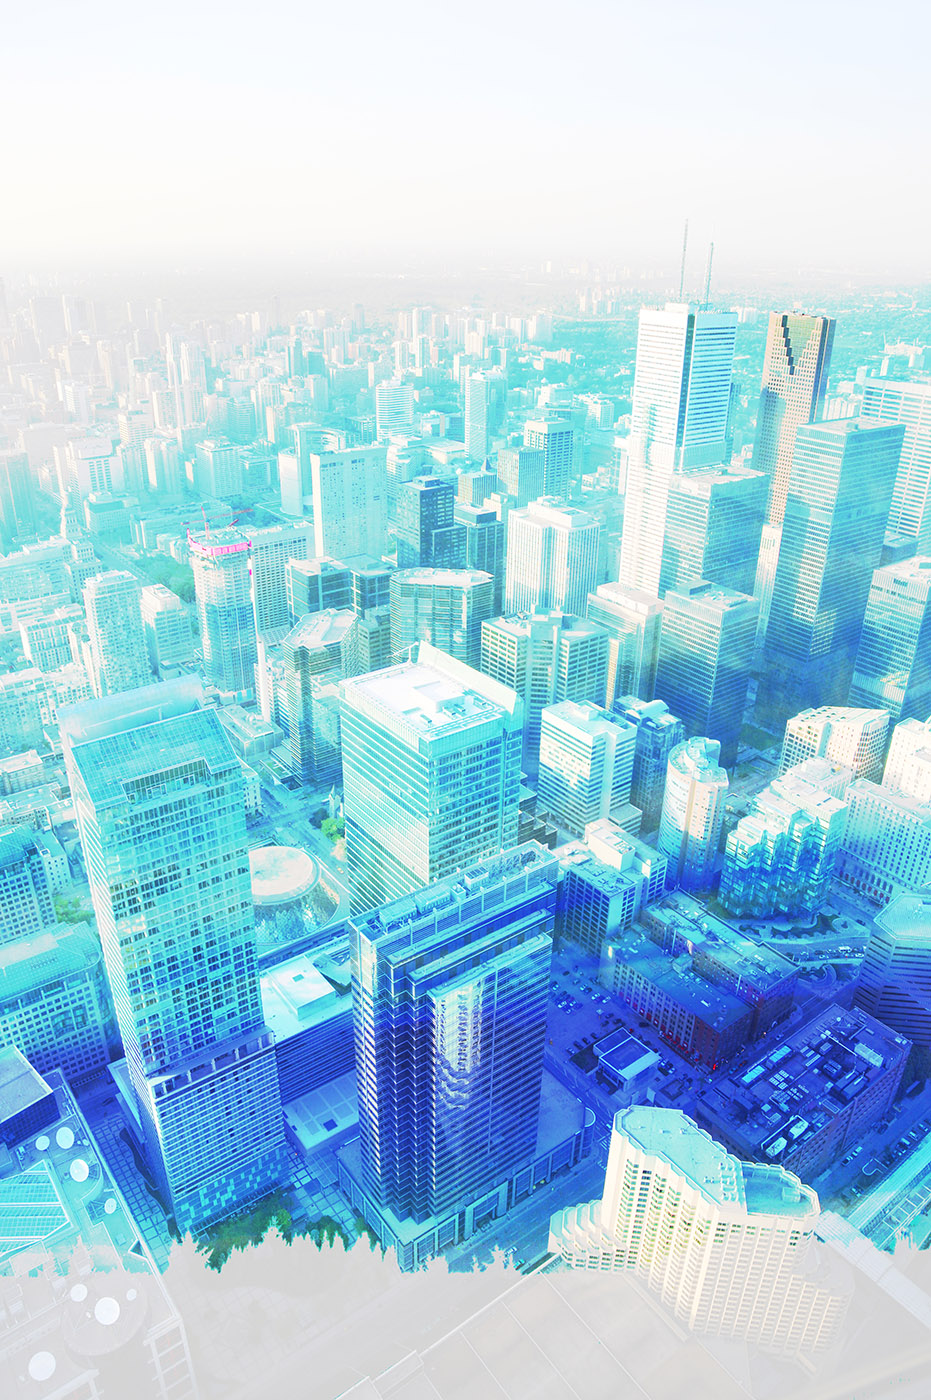 Urban Vertical Cityscape - Stock Photography